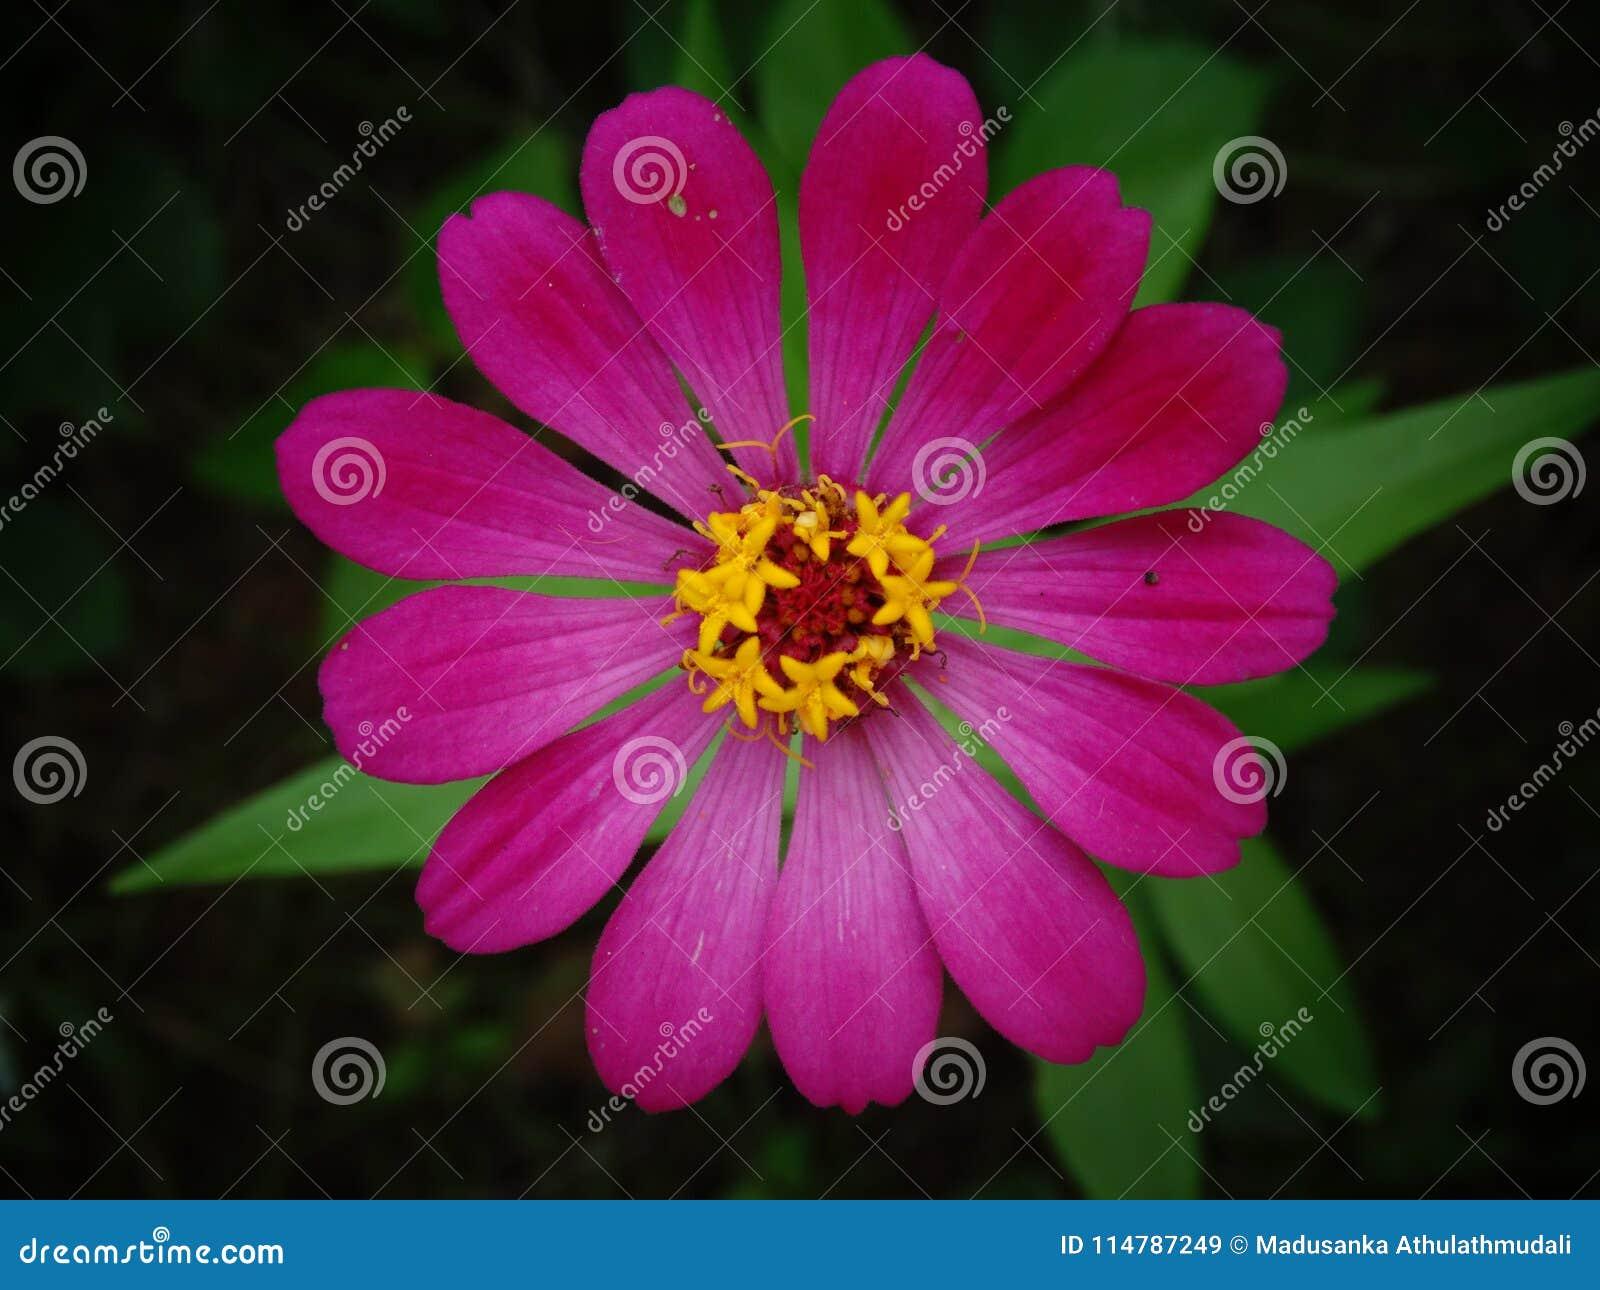 Beautiful zinnia flower closeup image